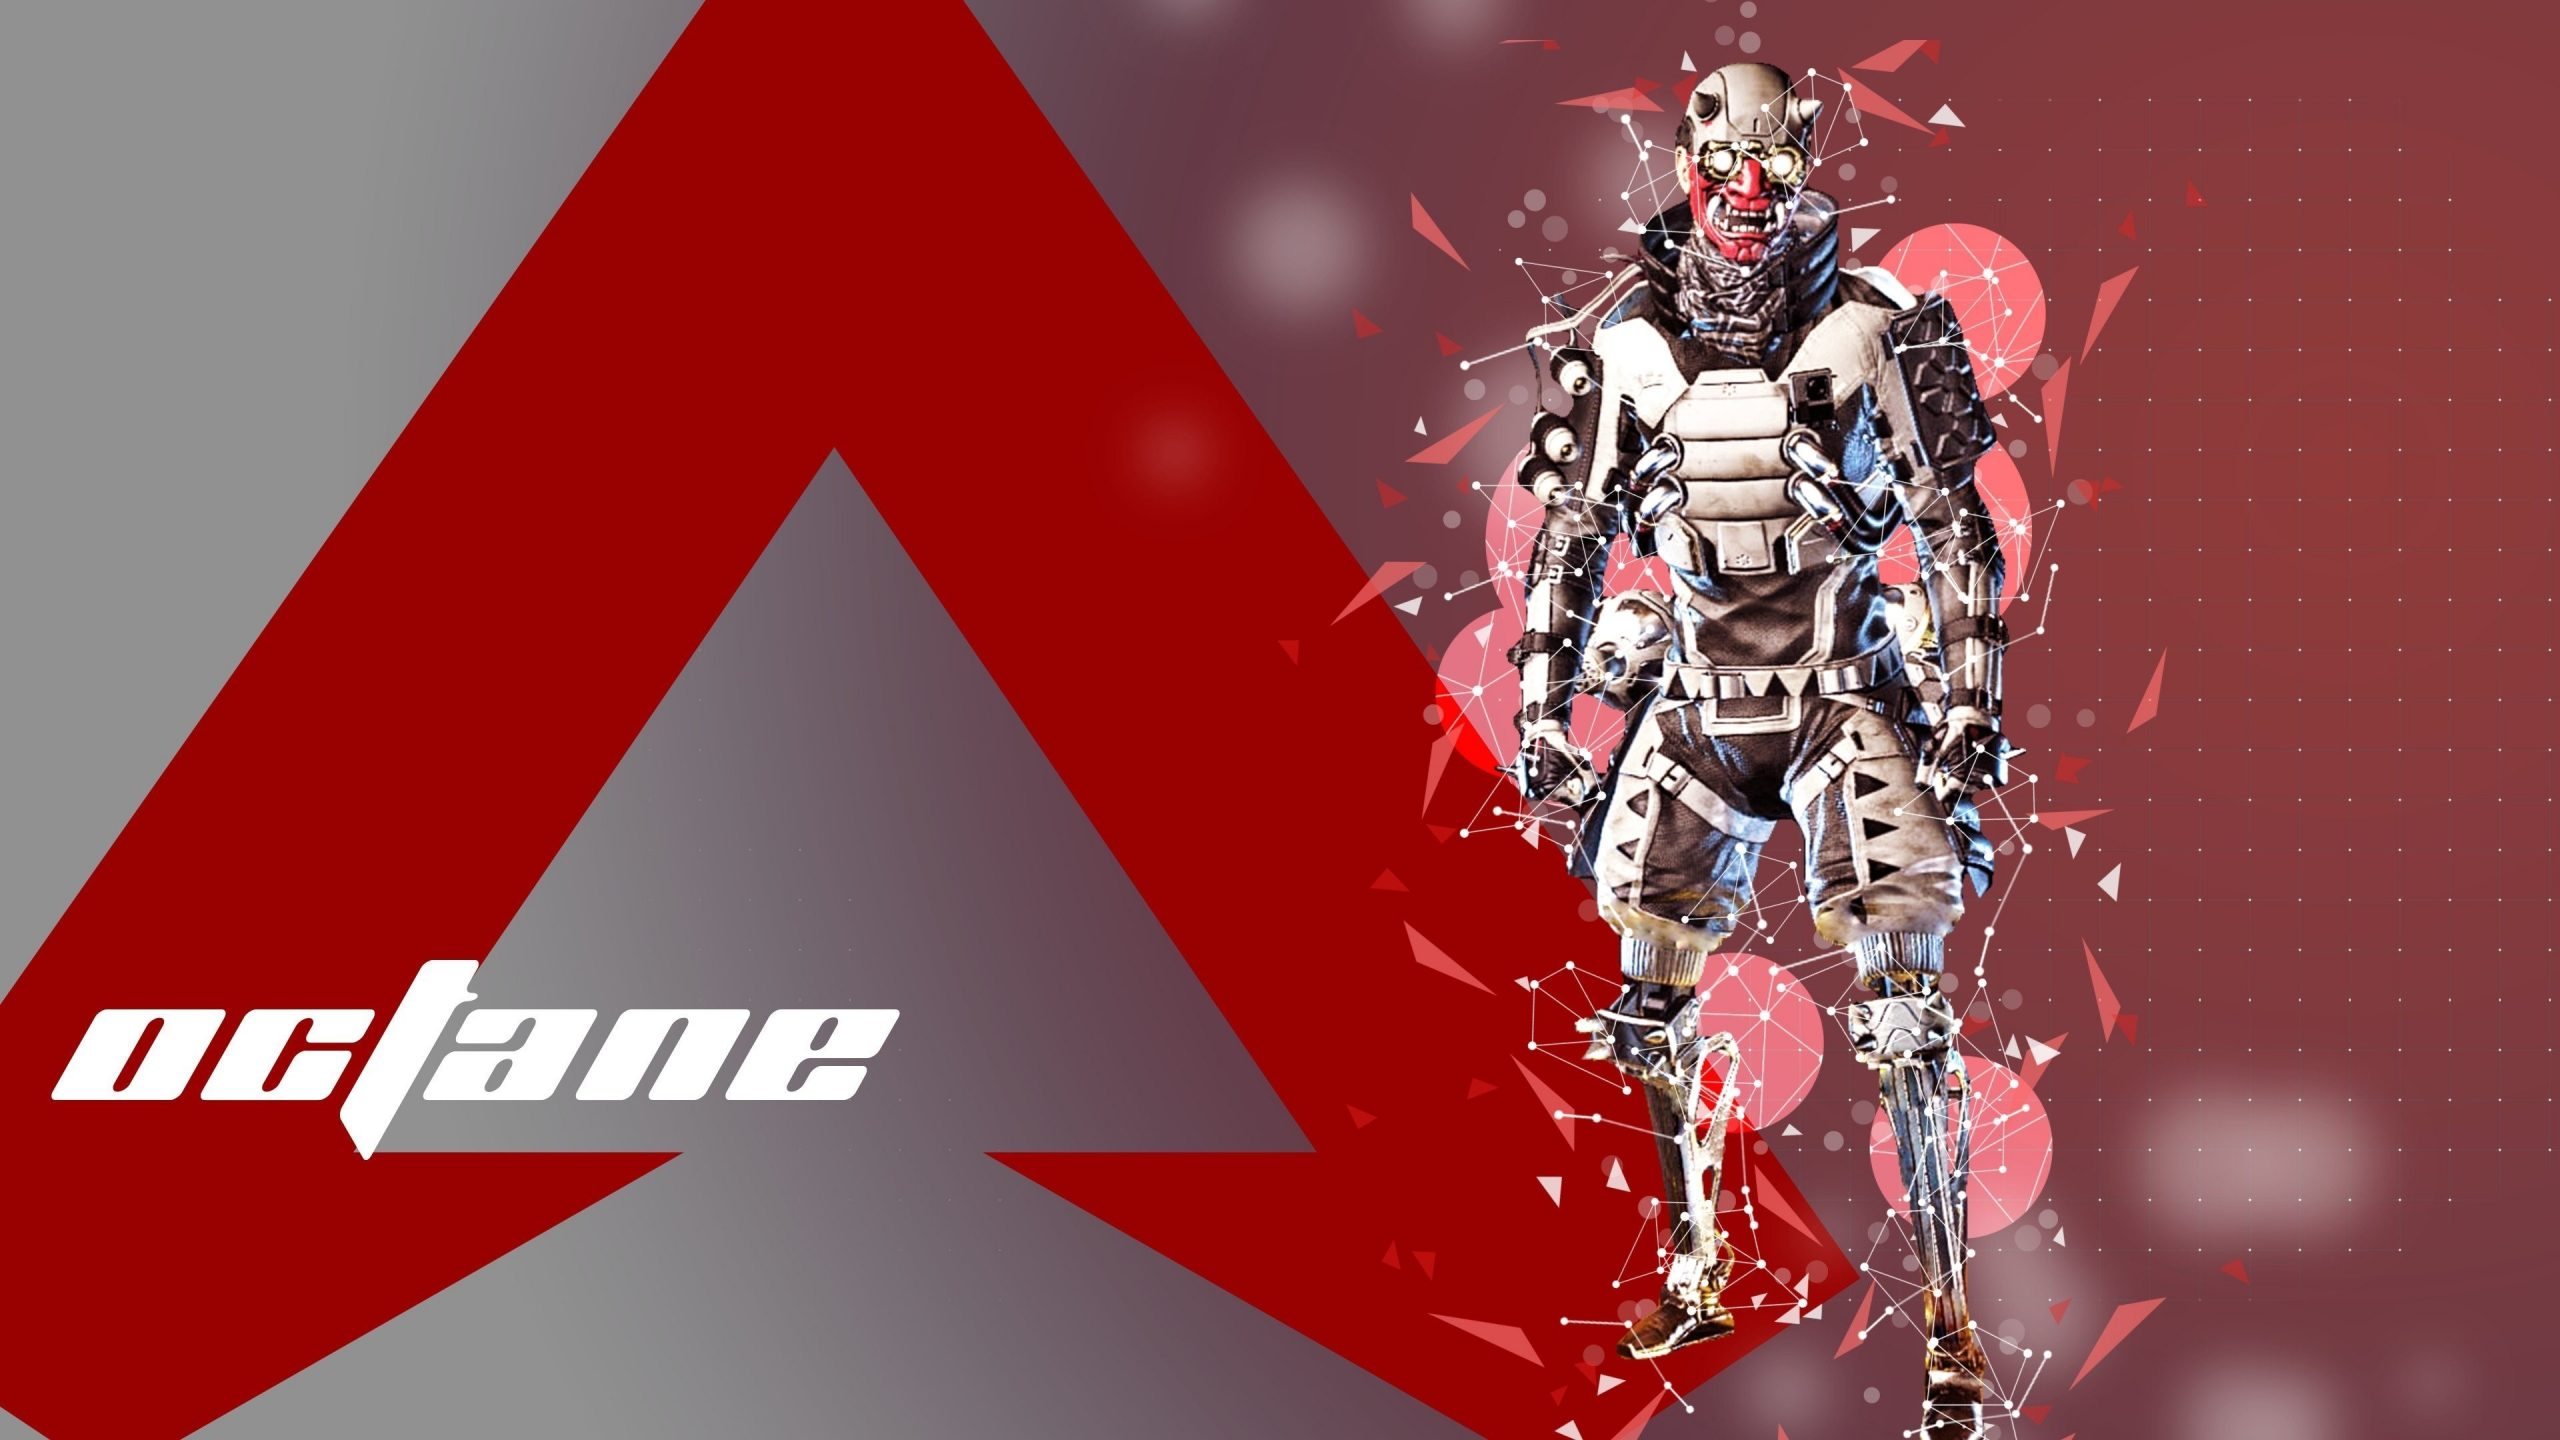 Apex Legends Octane Wall 4K scaled